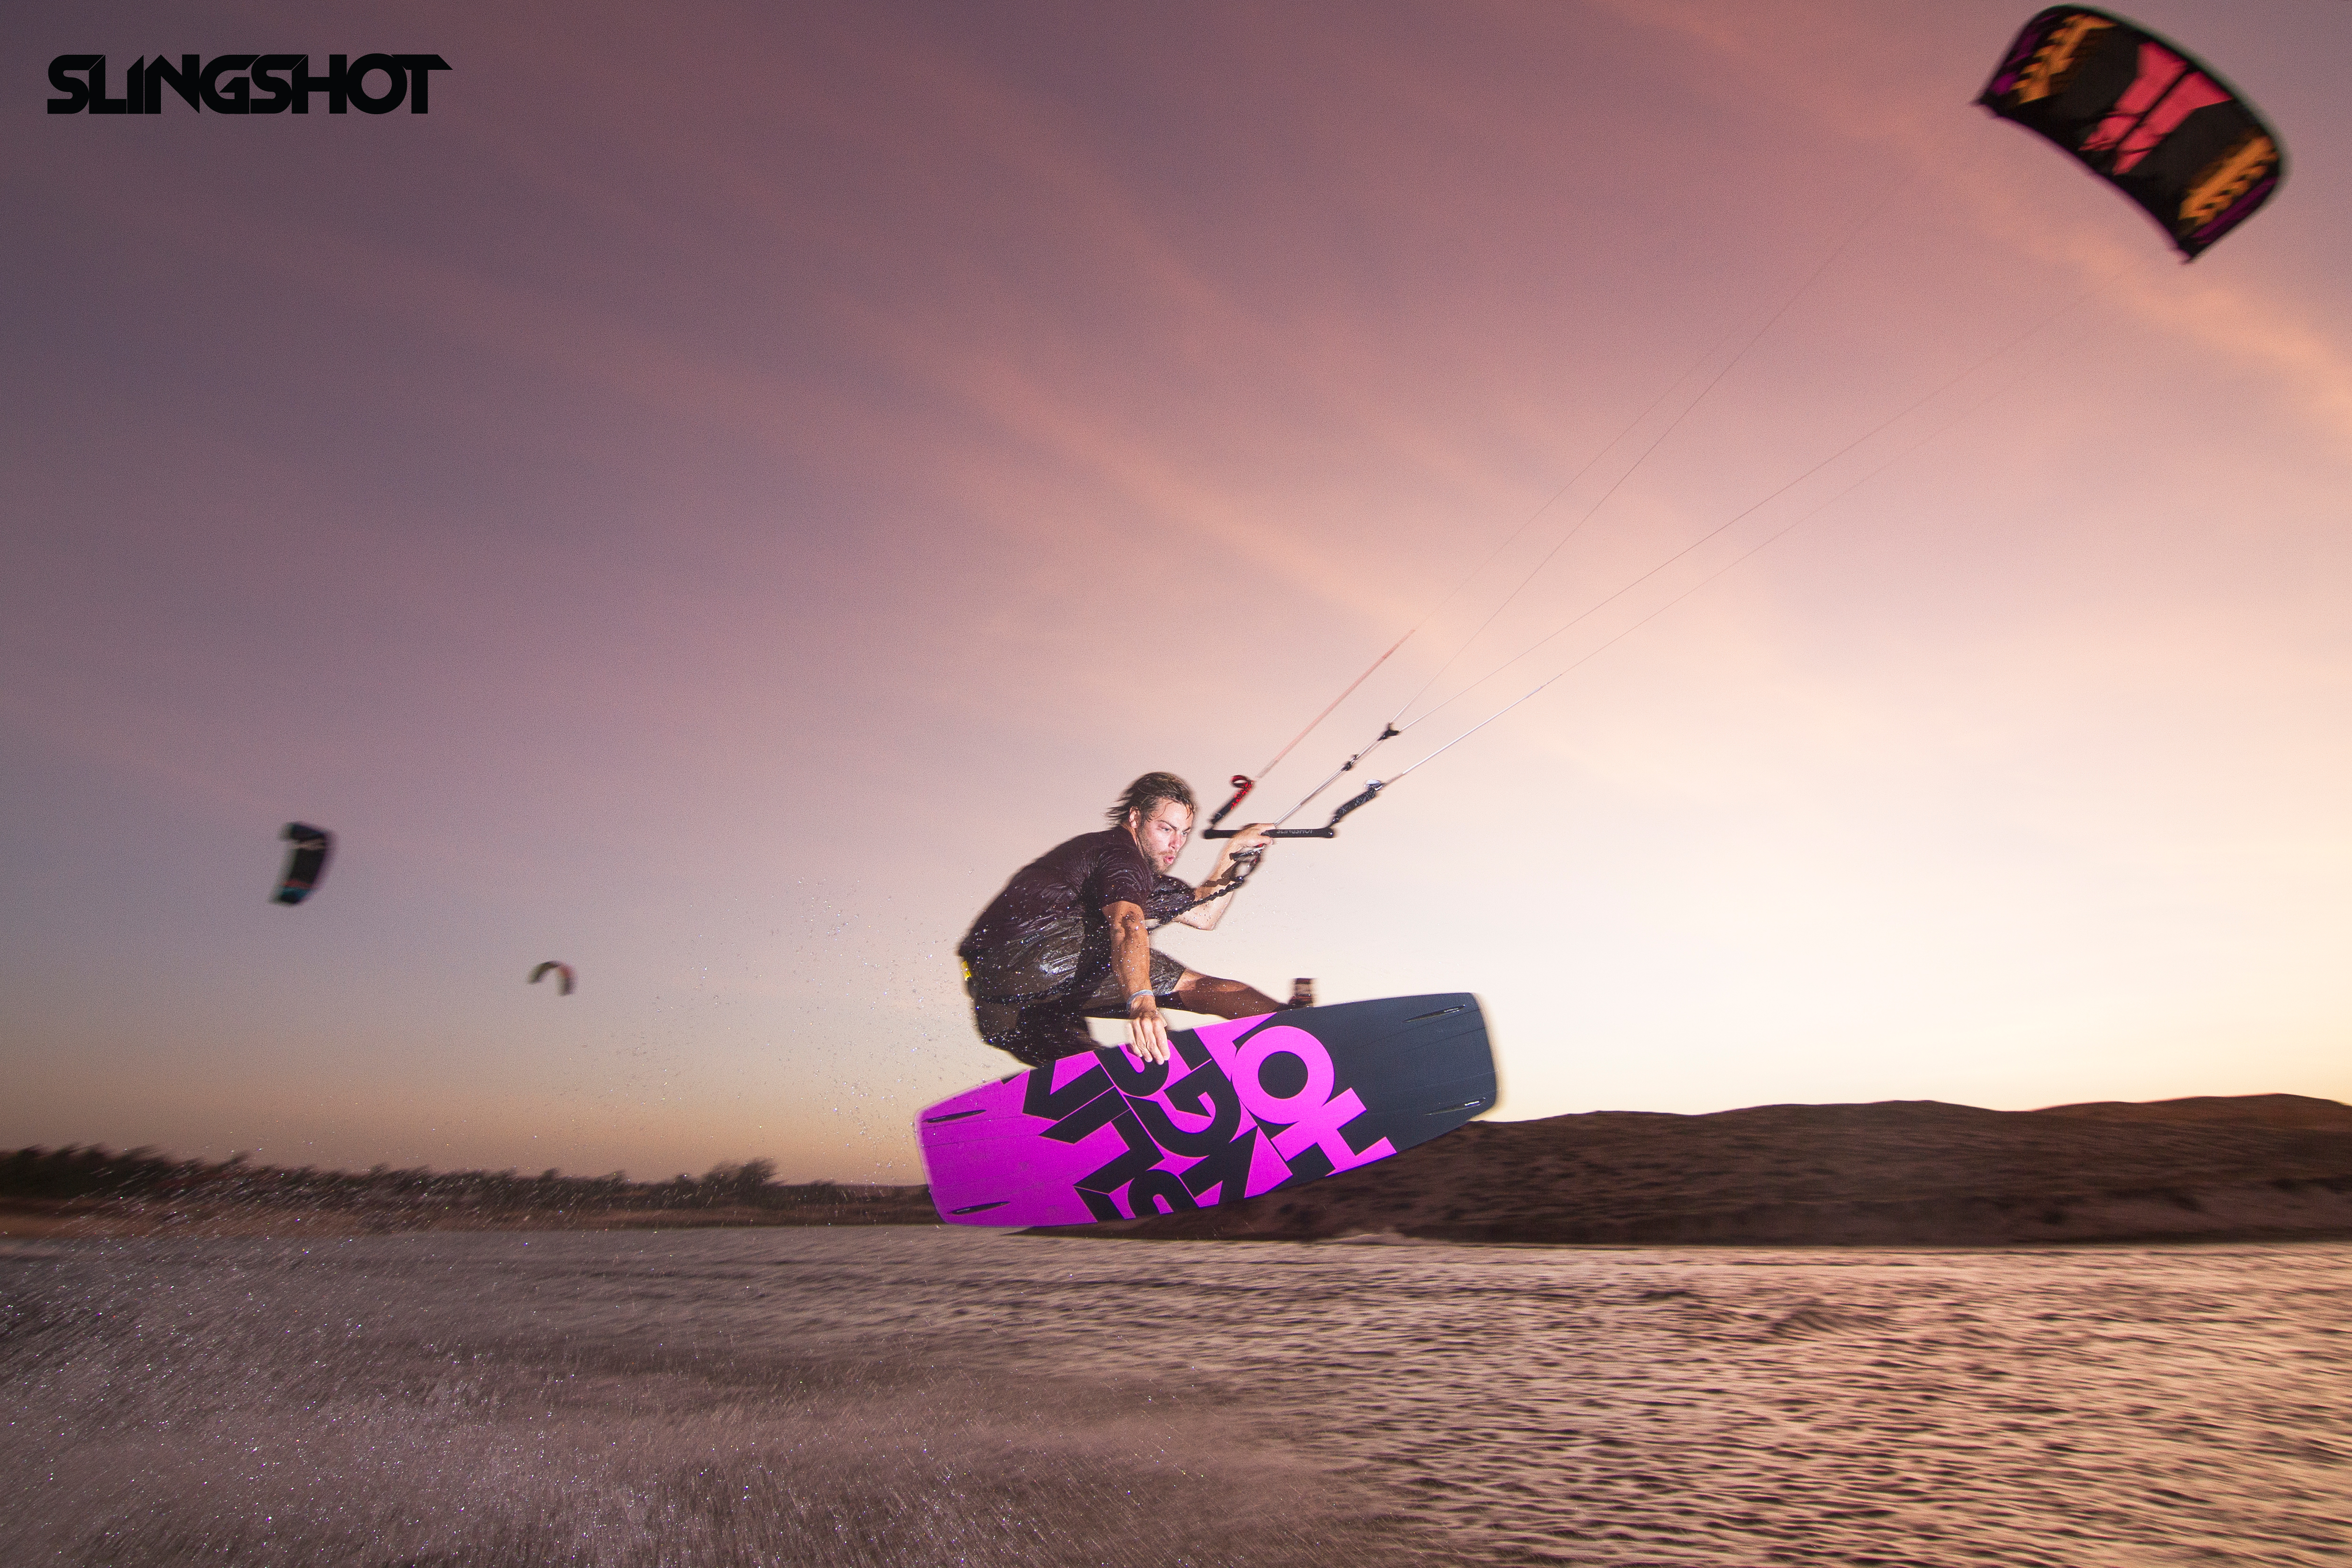 kitesurf wallpaper image - Grabbing some rail on the 2015 Slingshot Asylum board and flying the RPM kite. - in resolution: Original 4984 X 3323